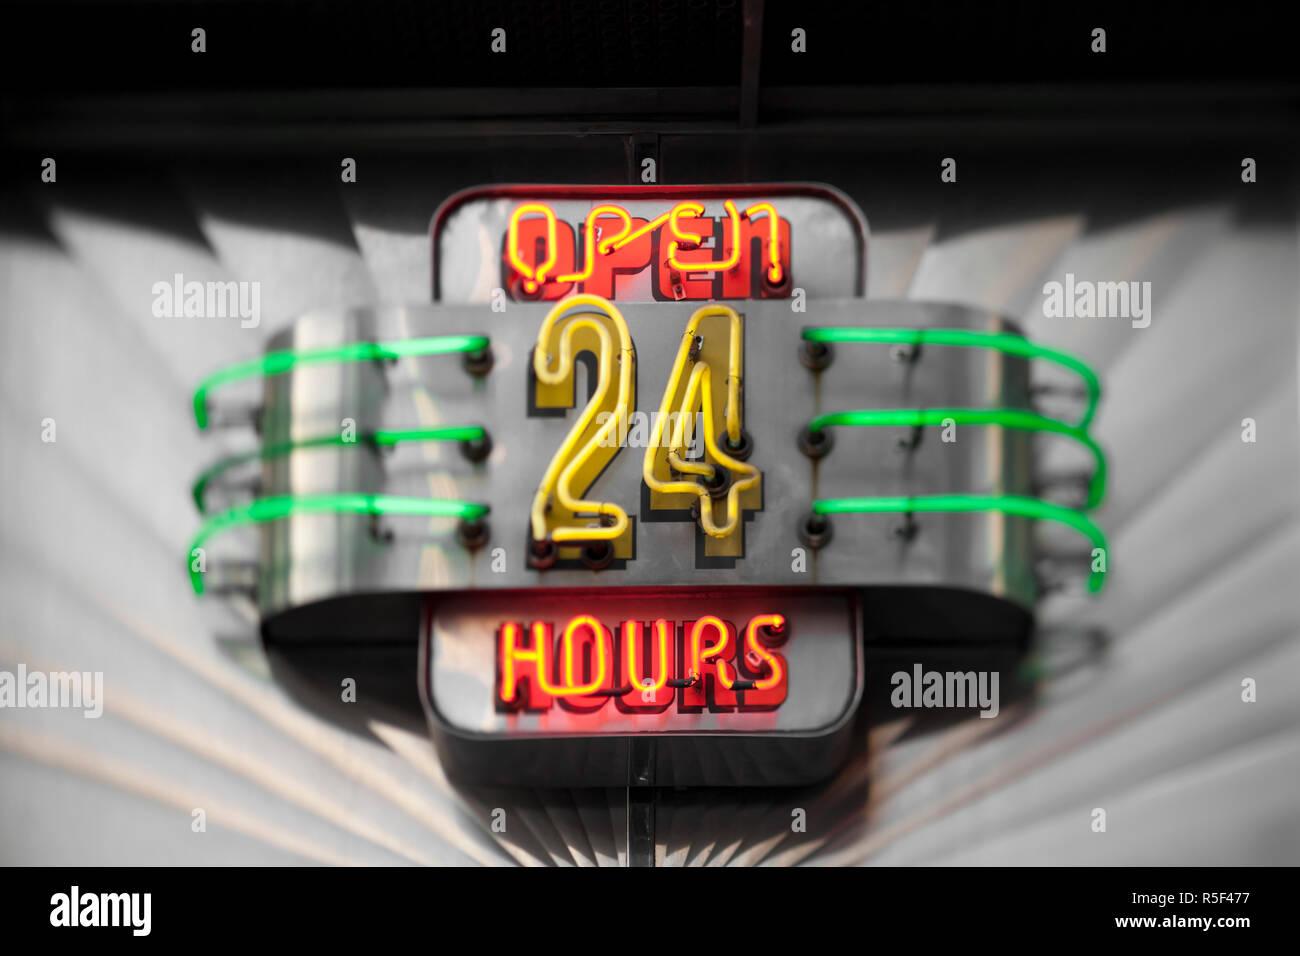 Tick Tock diner sign, Manhattan, New York City, USA - Stock Image